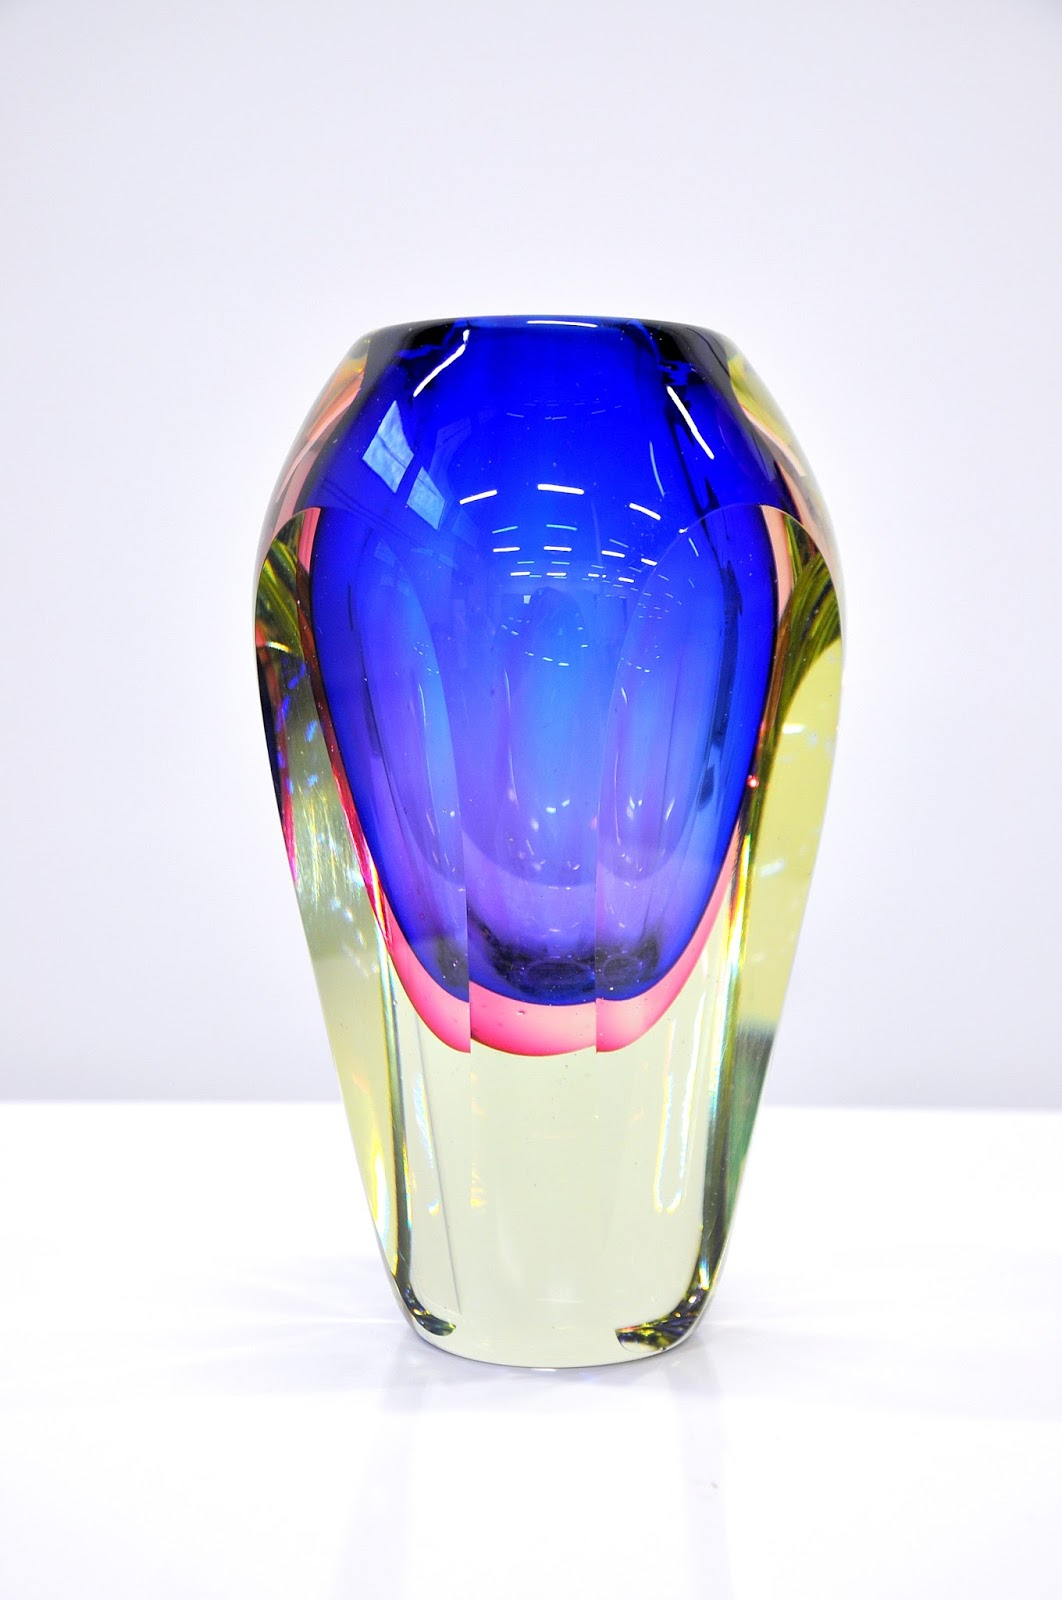 Select Modern Flavio Poli Seguso Murano Glass Sommerso Vase